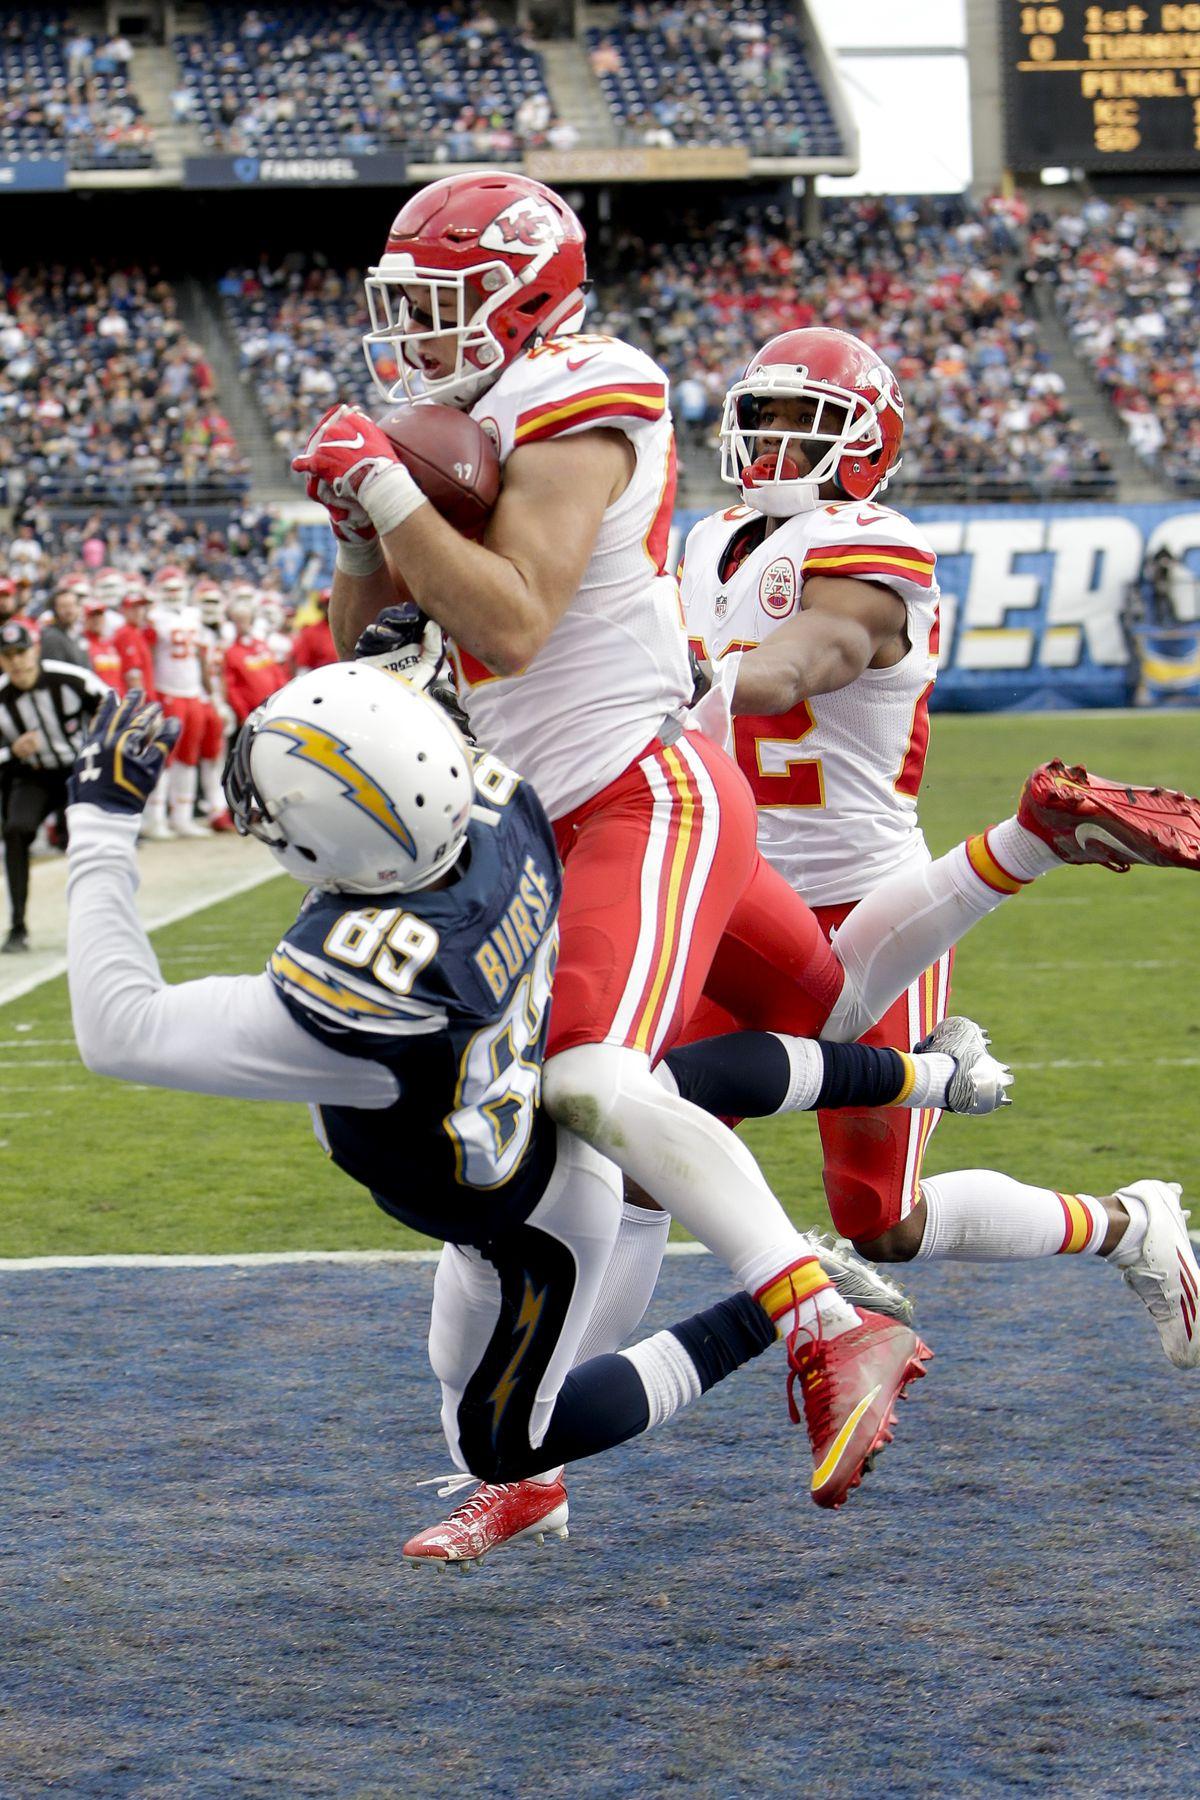 Kansas City and former BYU safety Daniel Sorensen intercepts a pass in an NFL game in 2017.